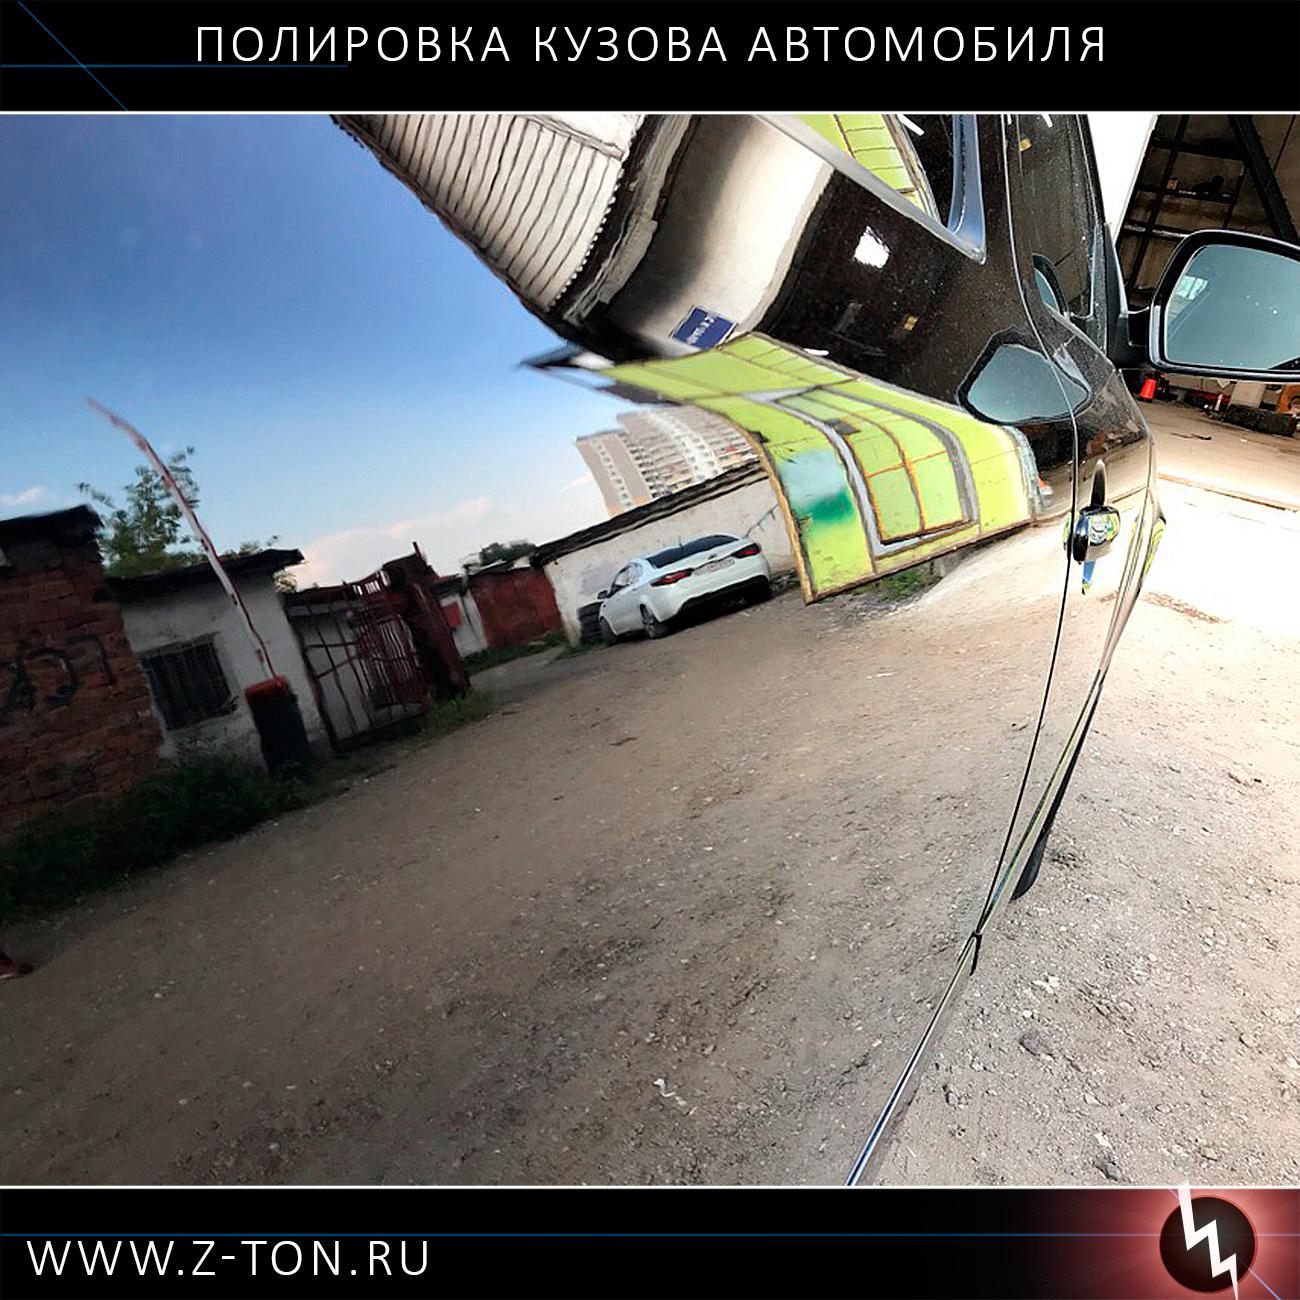 Полировка кузова в Зеленограде (Андреевка, Крюково, Москва)